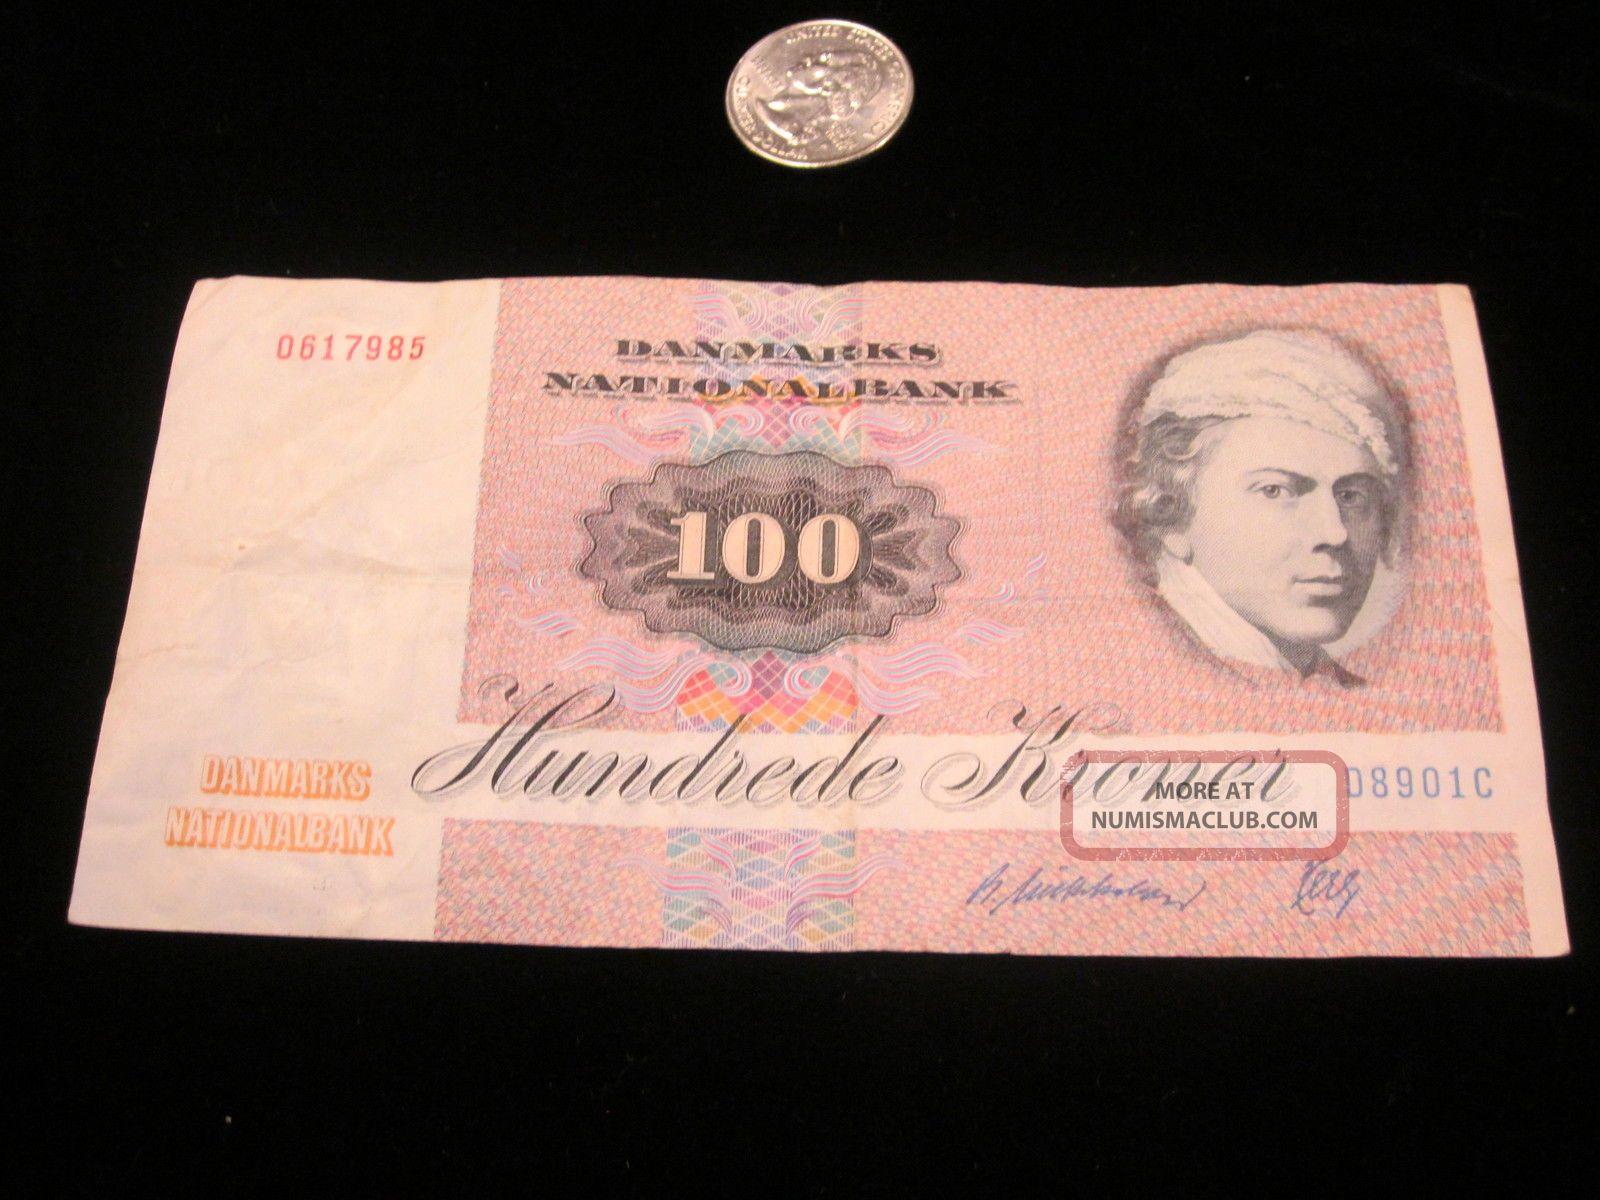 Denmark 100 Kroner P51 1986 Butterfly Unc Currency Money Bill Bank Note Europe photo